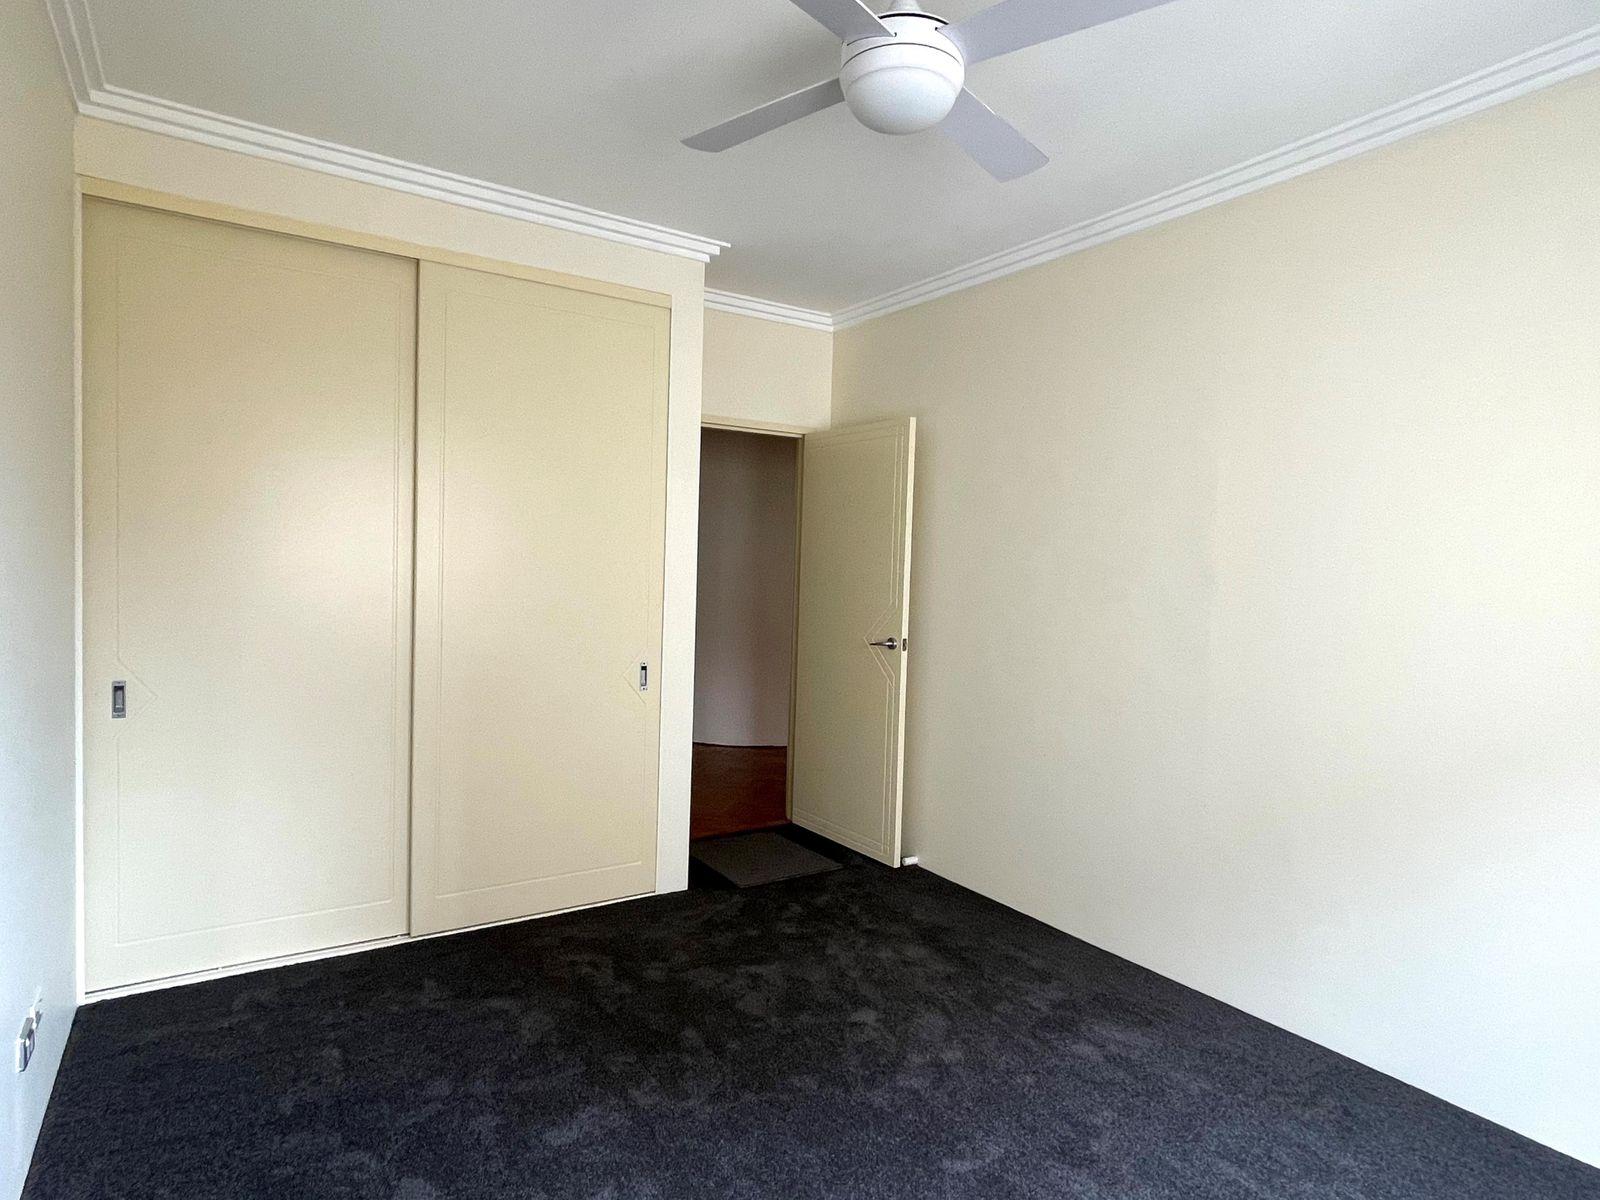 4/1-3 Queen Street, Newtown, NSW 2042